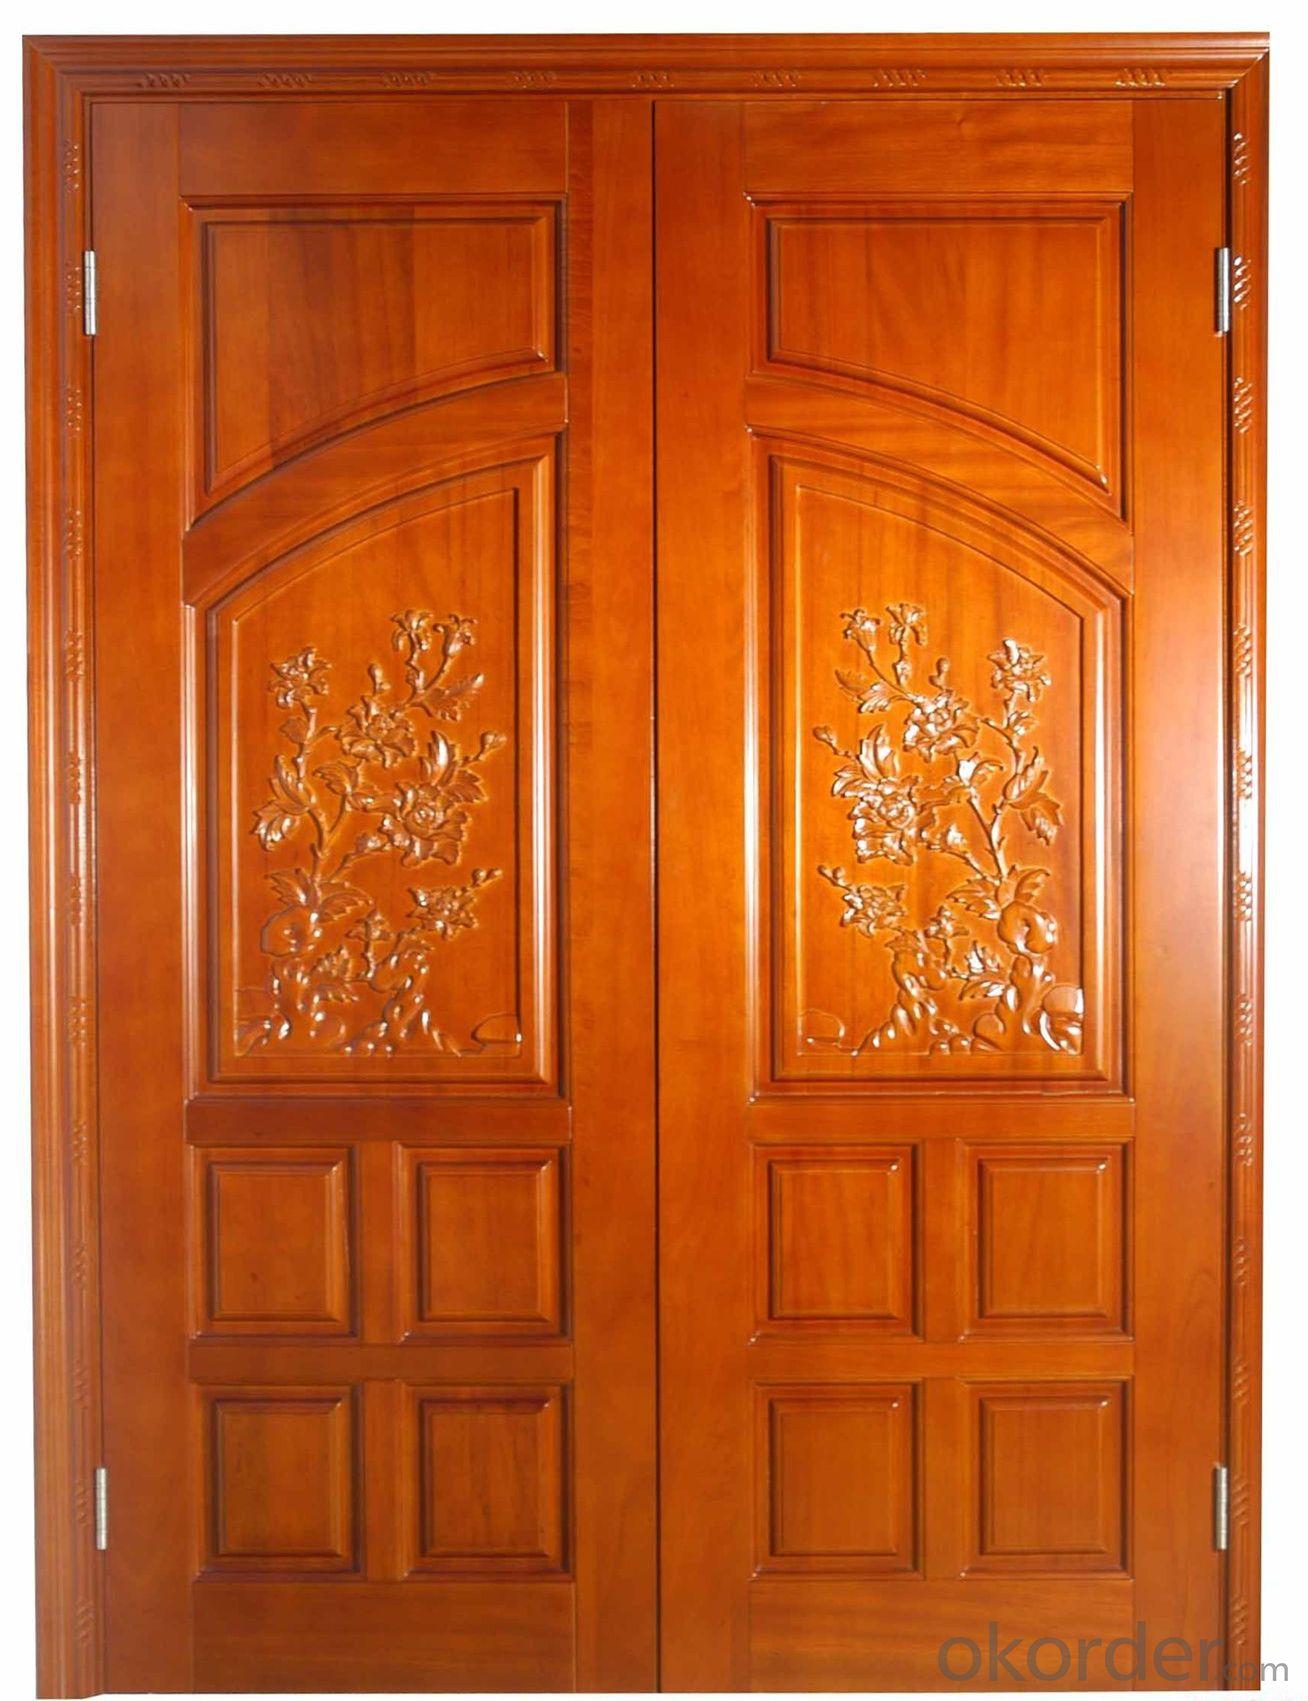 Green Environmental PAINTED WOODEN DOORS